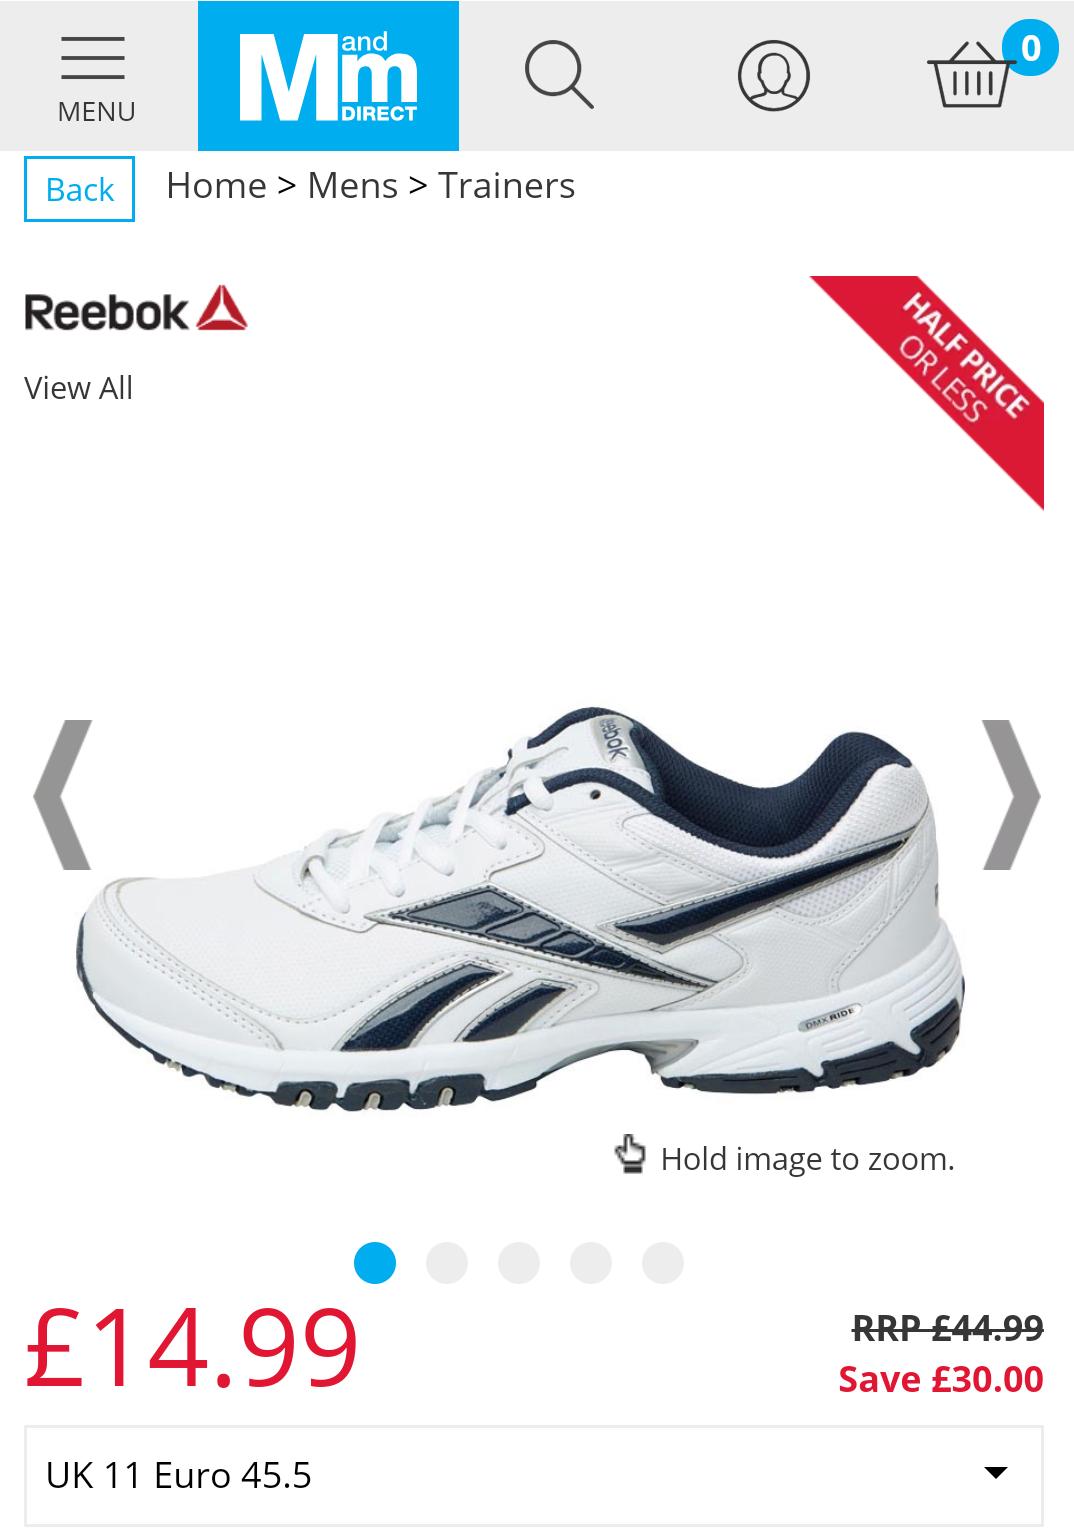 Reebok Mens Neche DMX Ride Training Shoes White/Navy/Silver - £14.99 @ MandM Direct